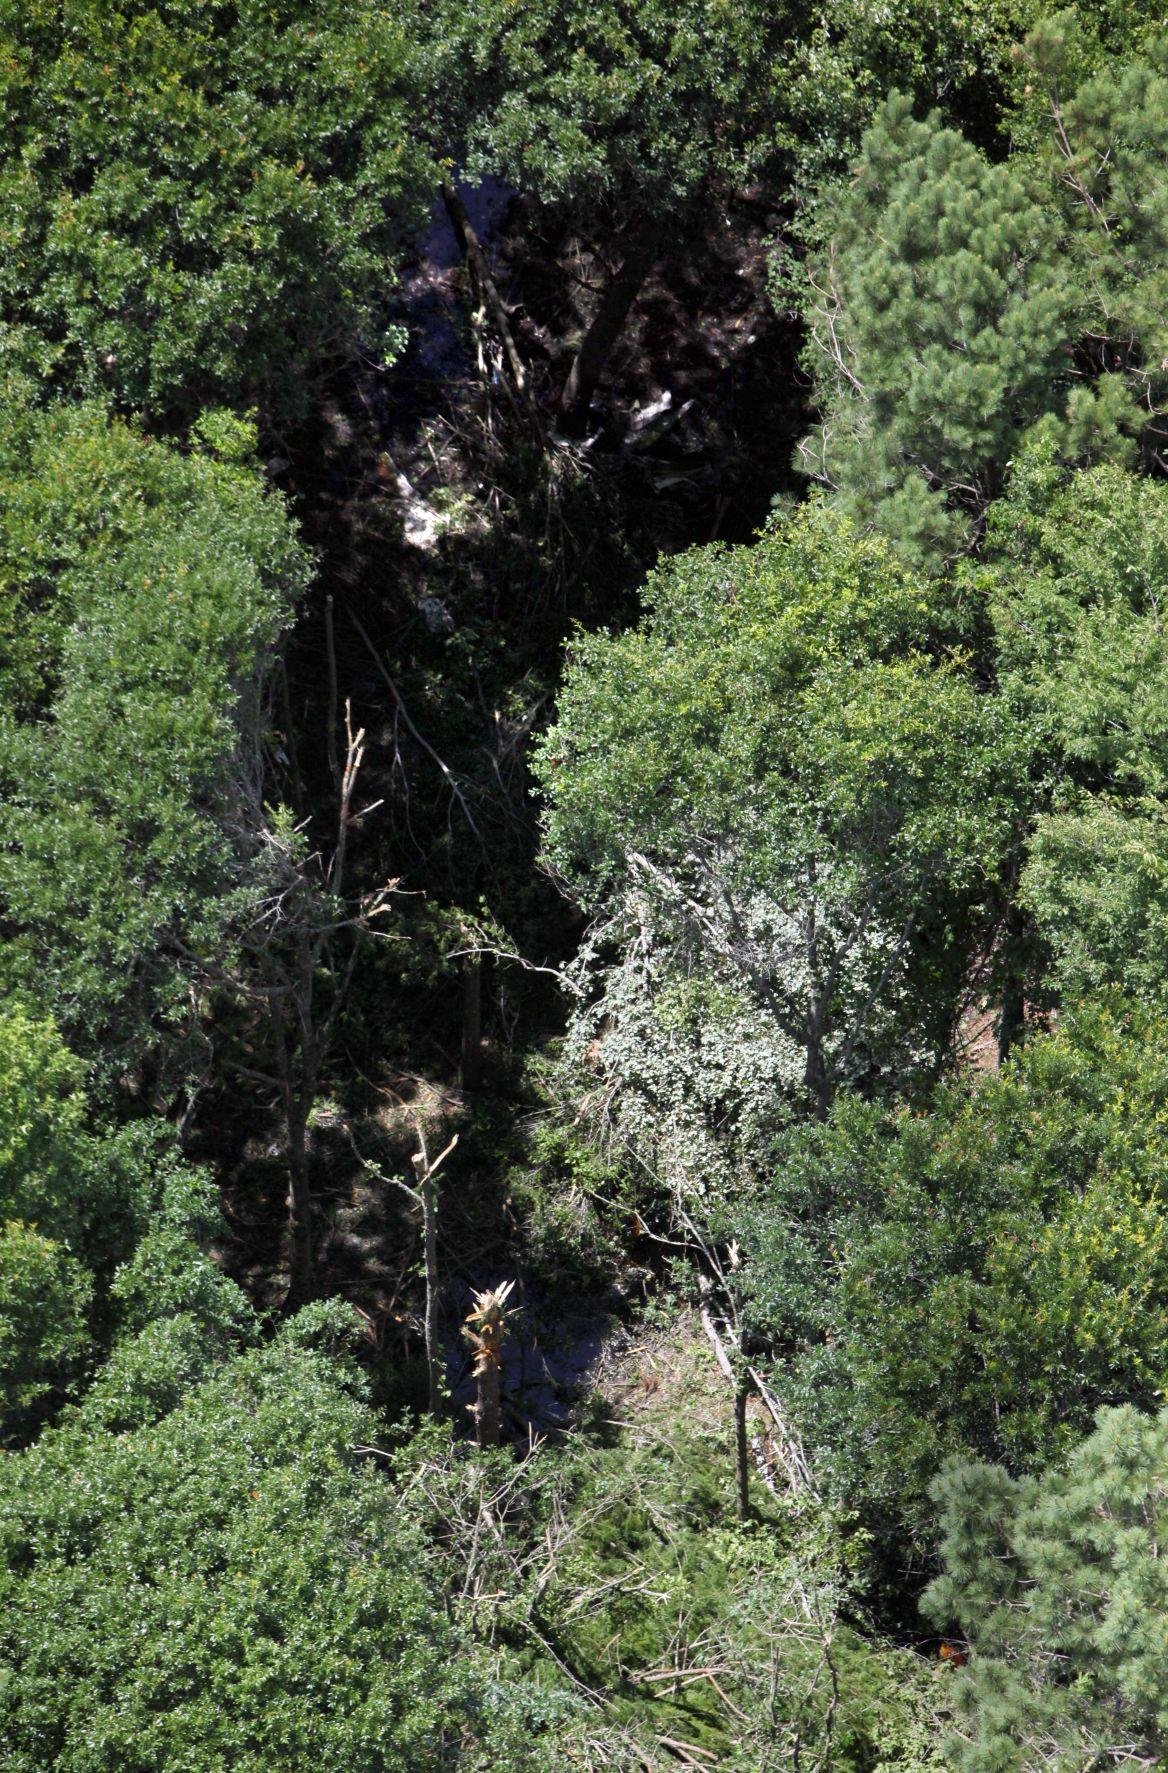 NTSB: Pilots had 'in-flight loss of control' before plane crash in McClellanville area last week